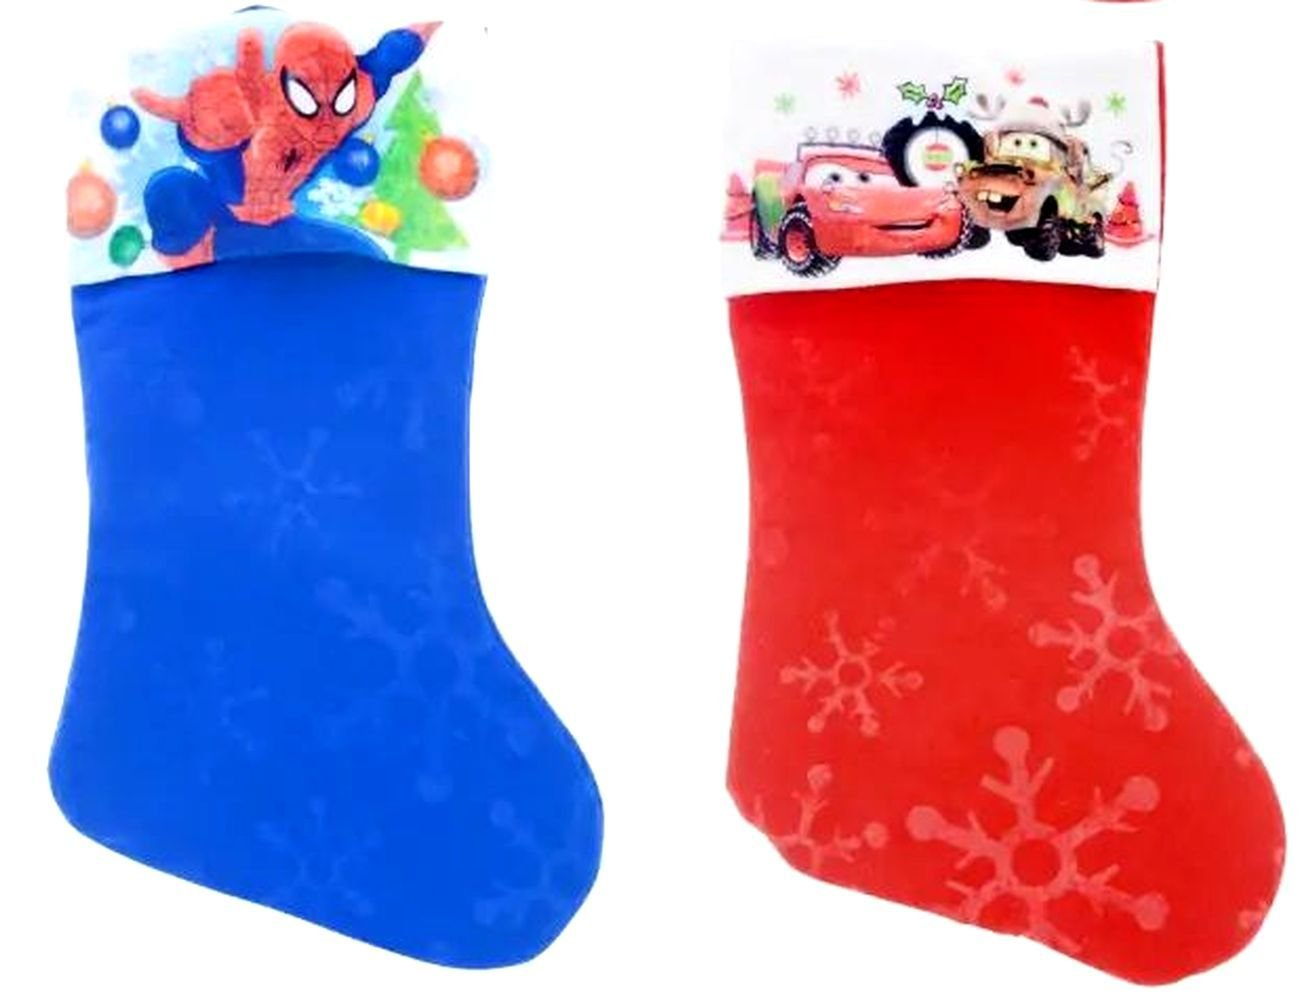 "Spider-Man - Cars - 18"" Felt Christmas Stockings - (Set of 2)"